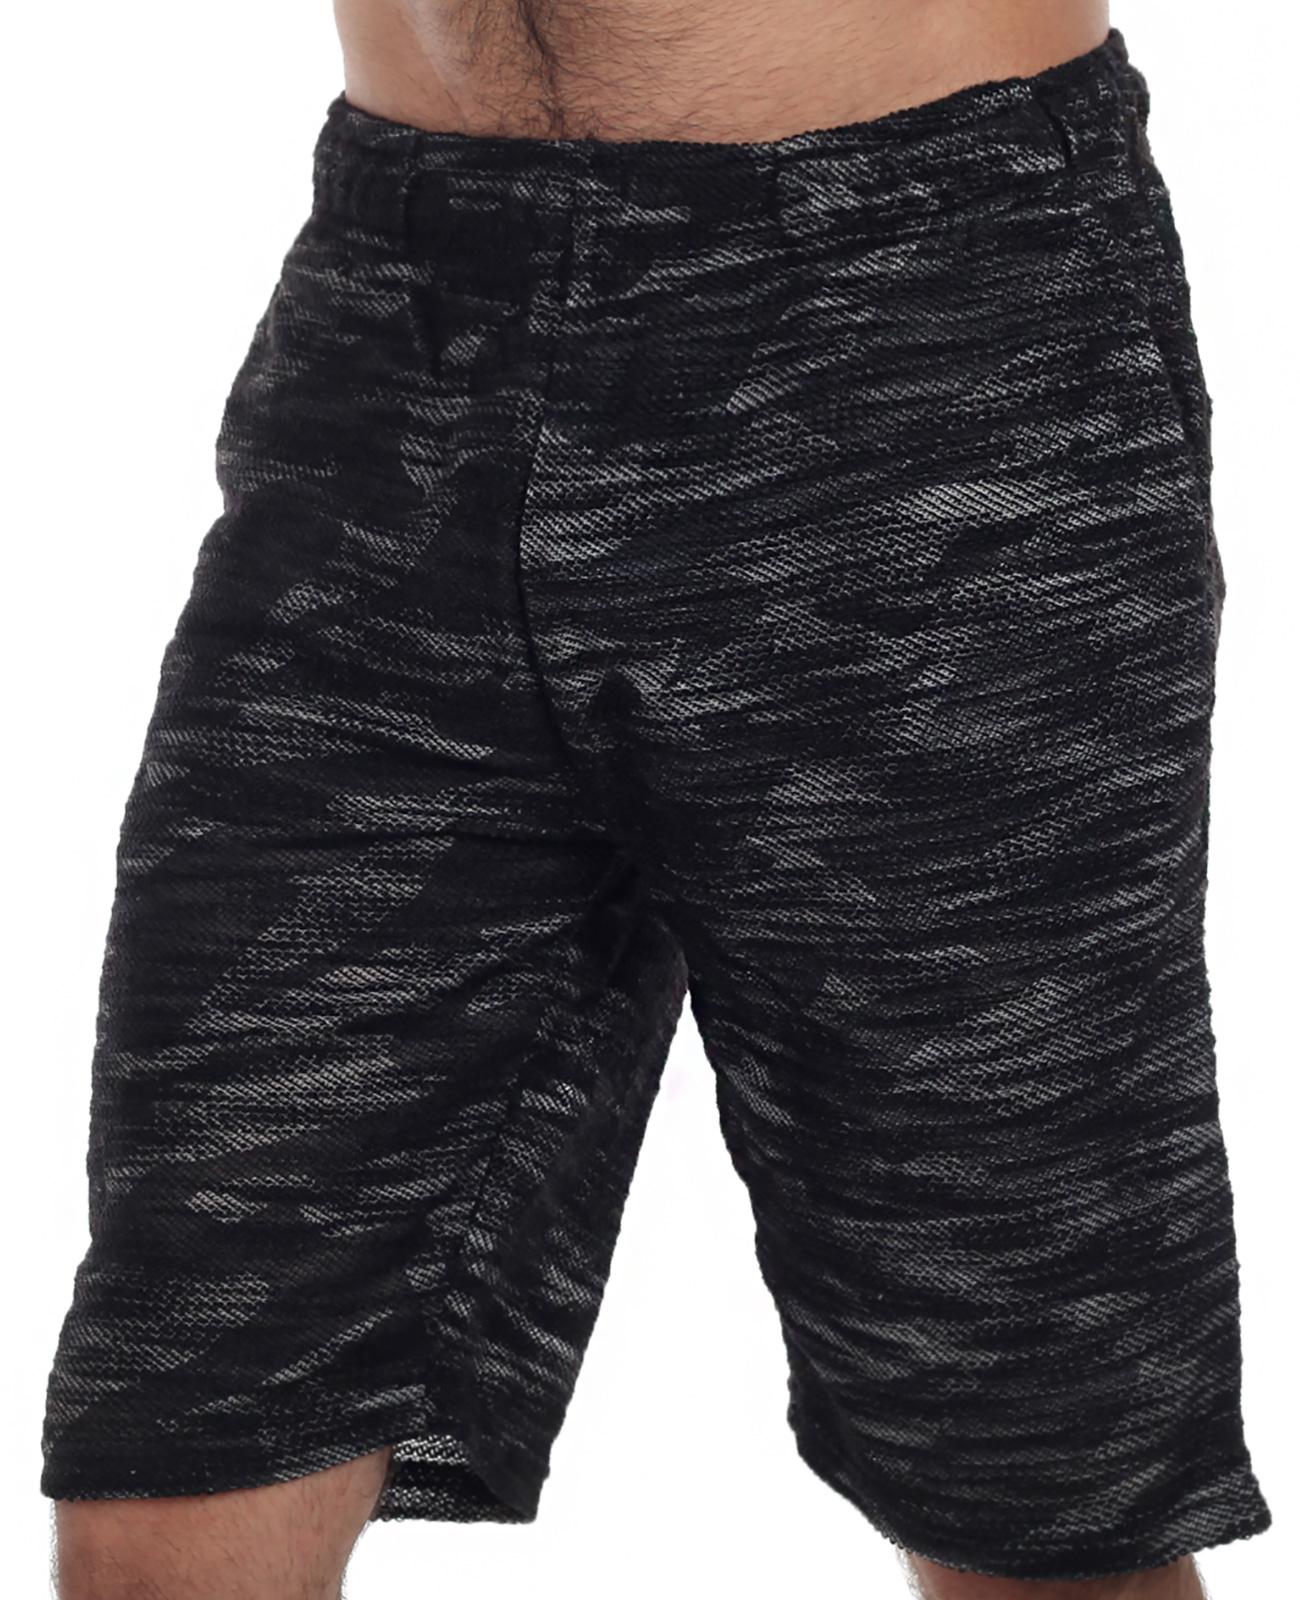 Свободные мужские шорты-бермуды от японского бренда Growth by Grail.